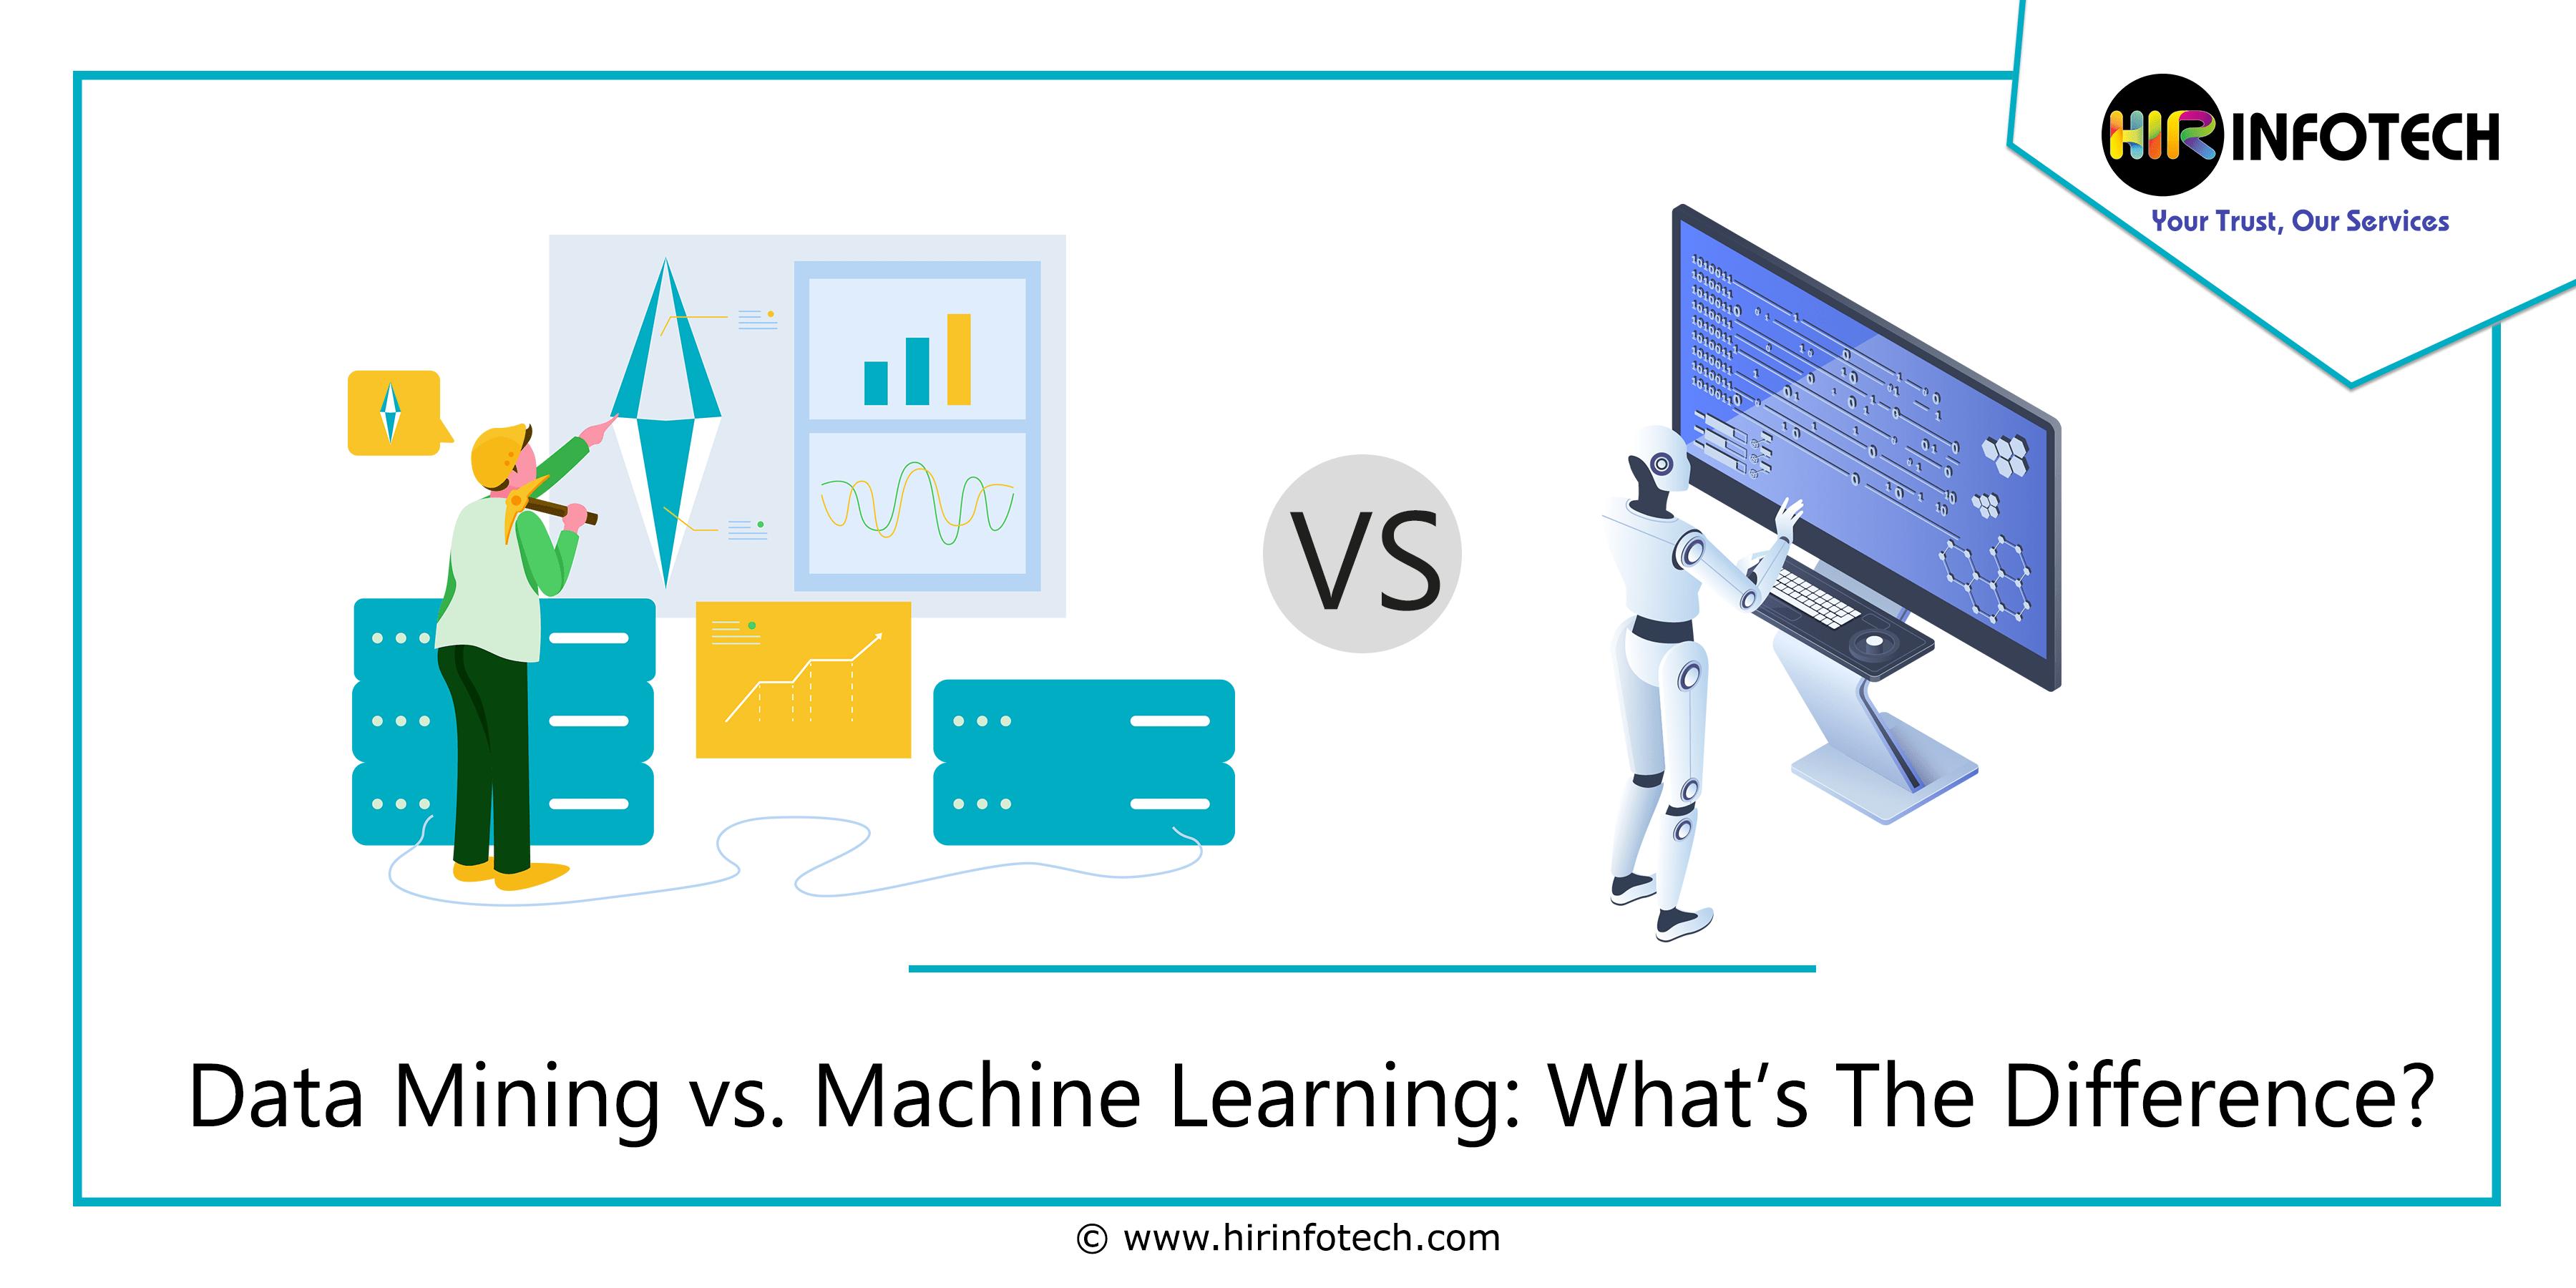 Data Mining vs. Machine Learning